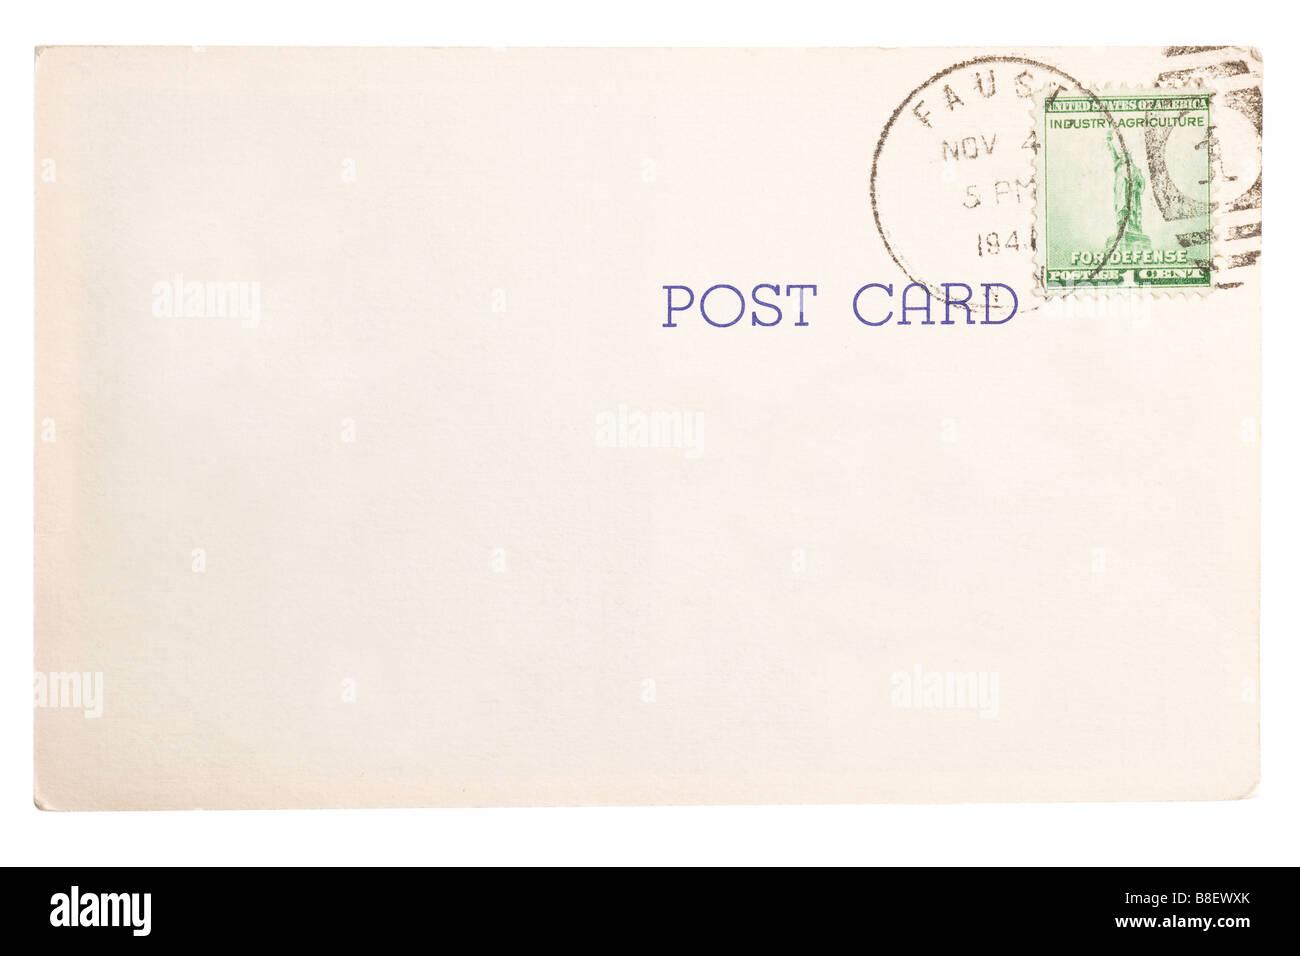 Vintage yellowed postcard with postmark stamp - Stock Image